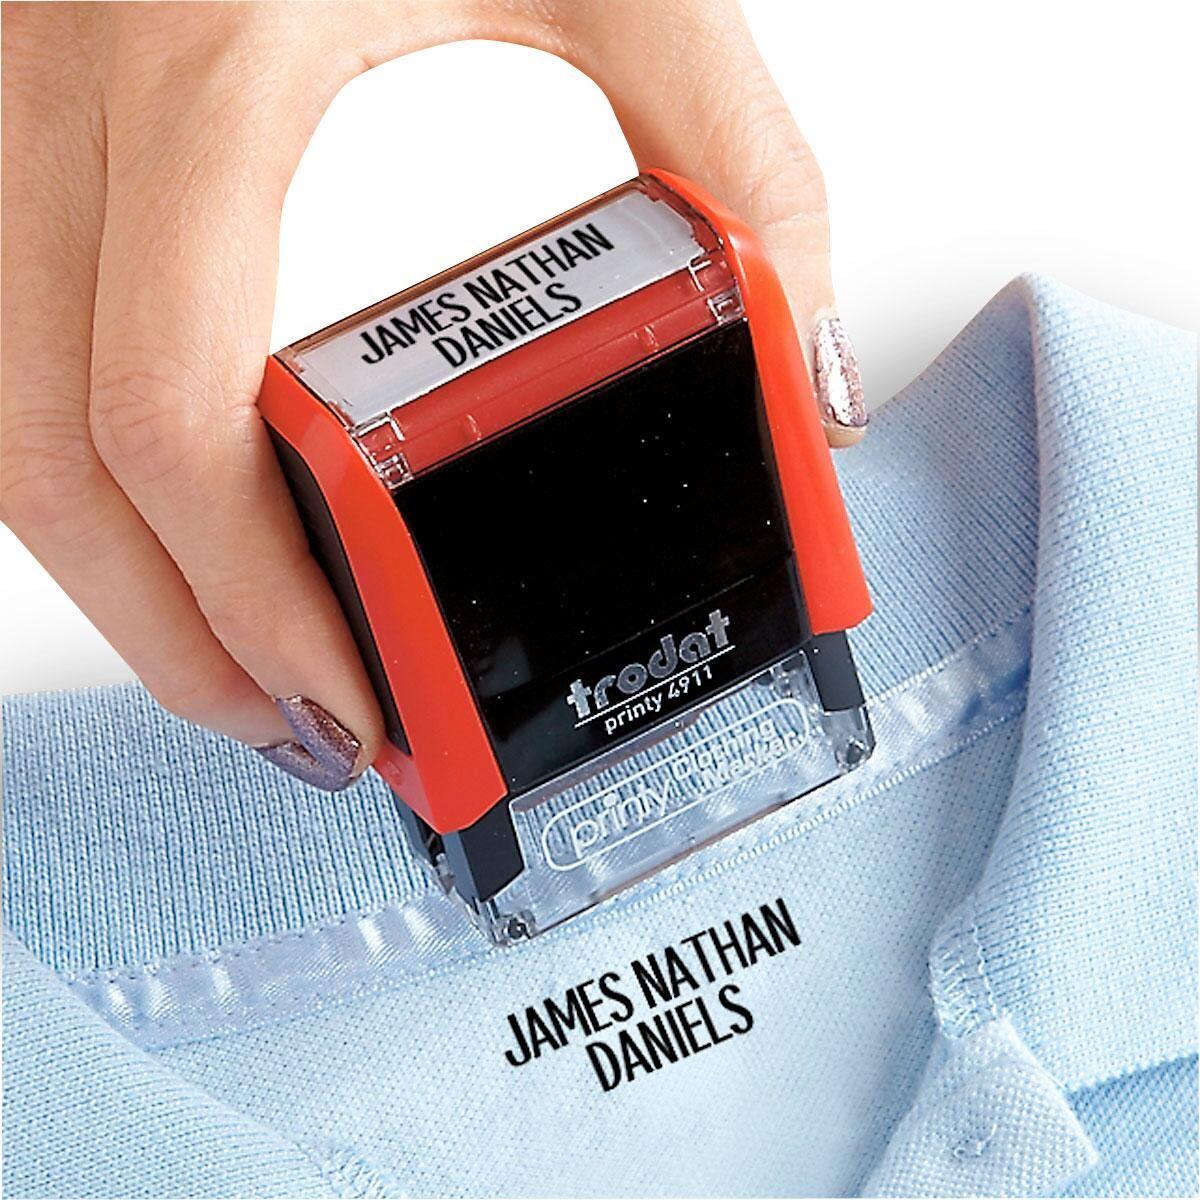 Clothing Stamp